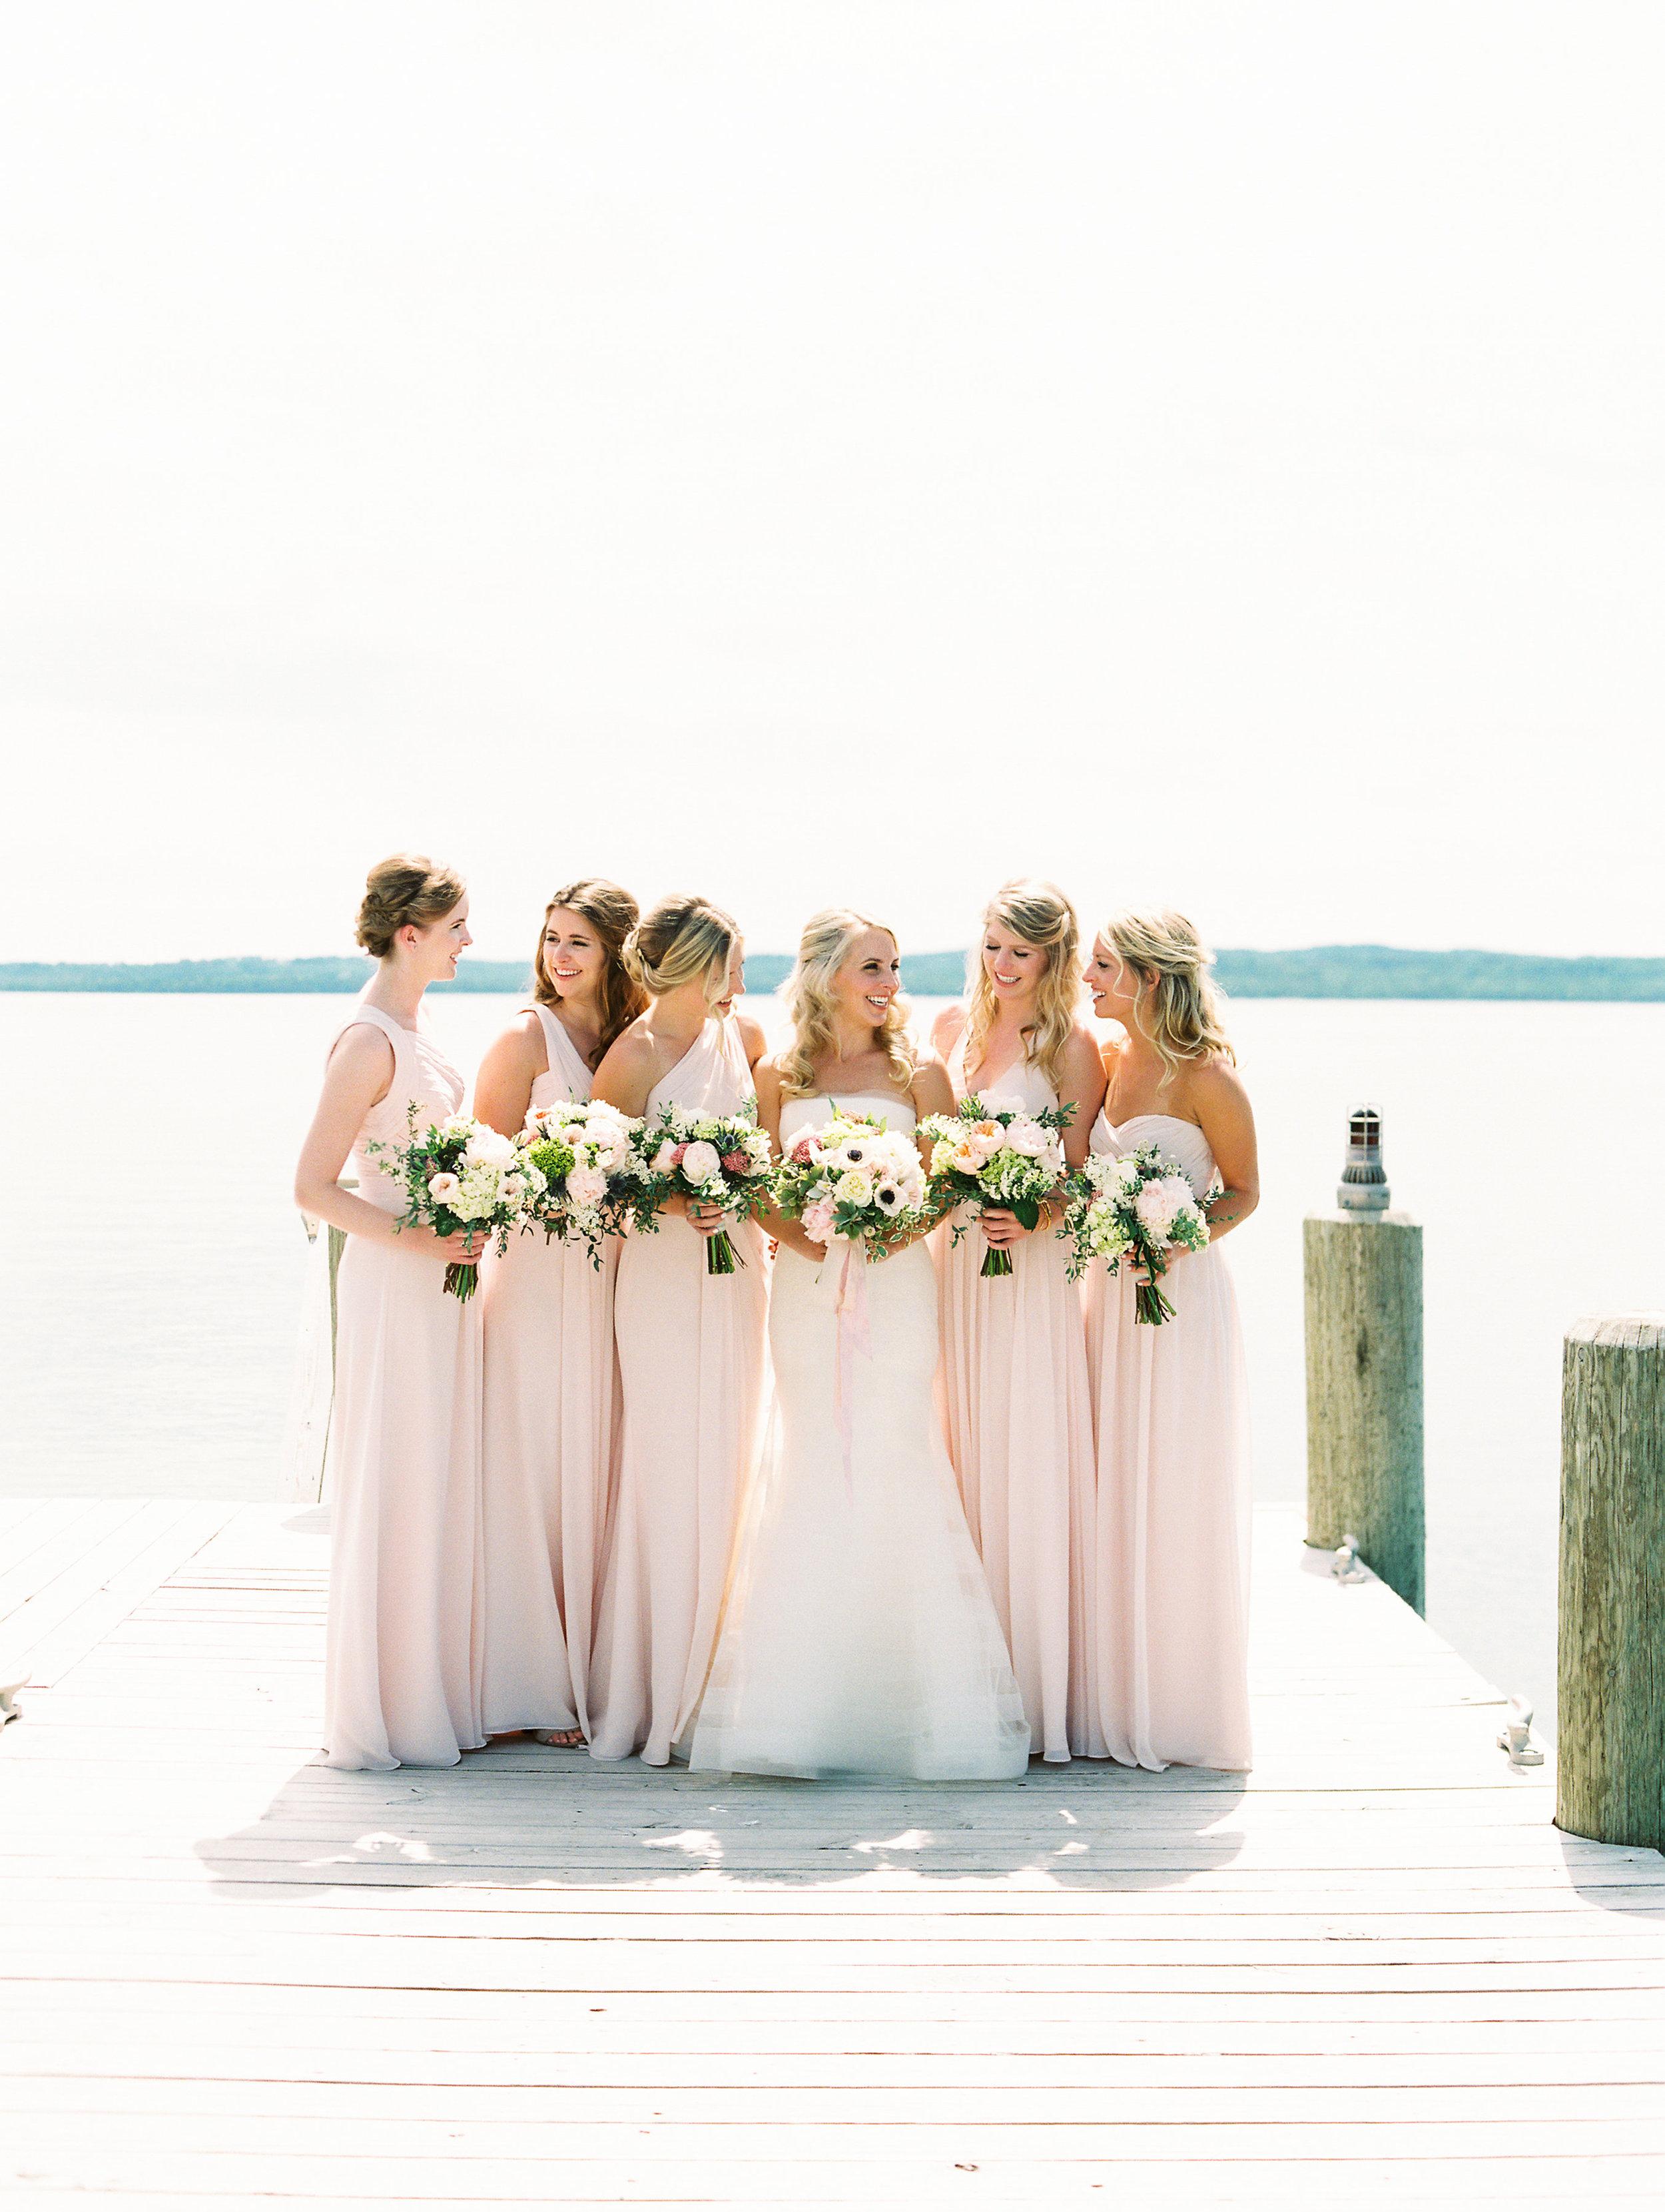 Coffman+Wedding+Bridal+Party-18.jpg